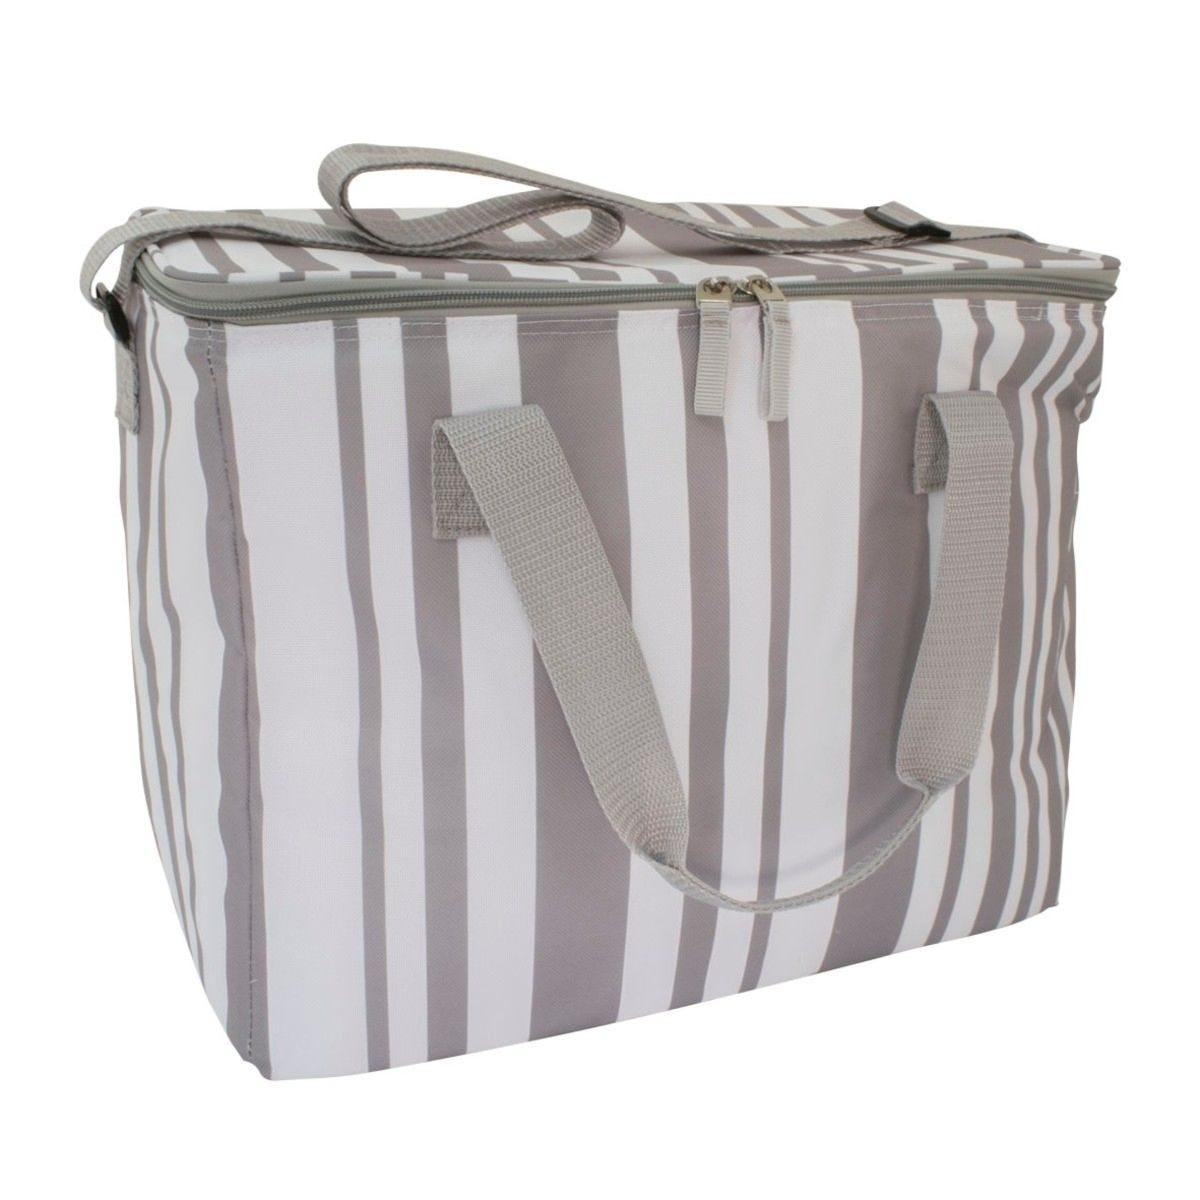 Grey Striped Family Cool Bag - 20L